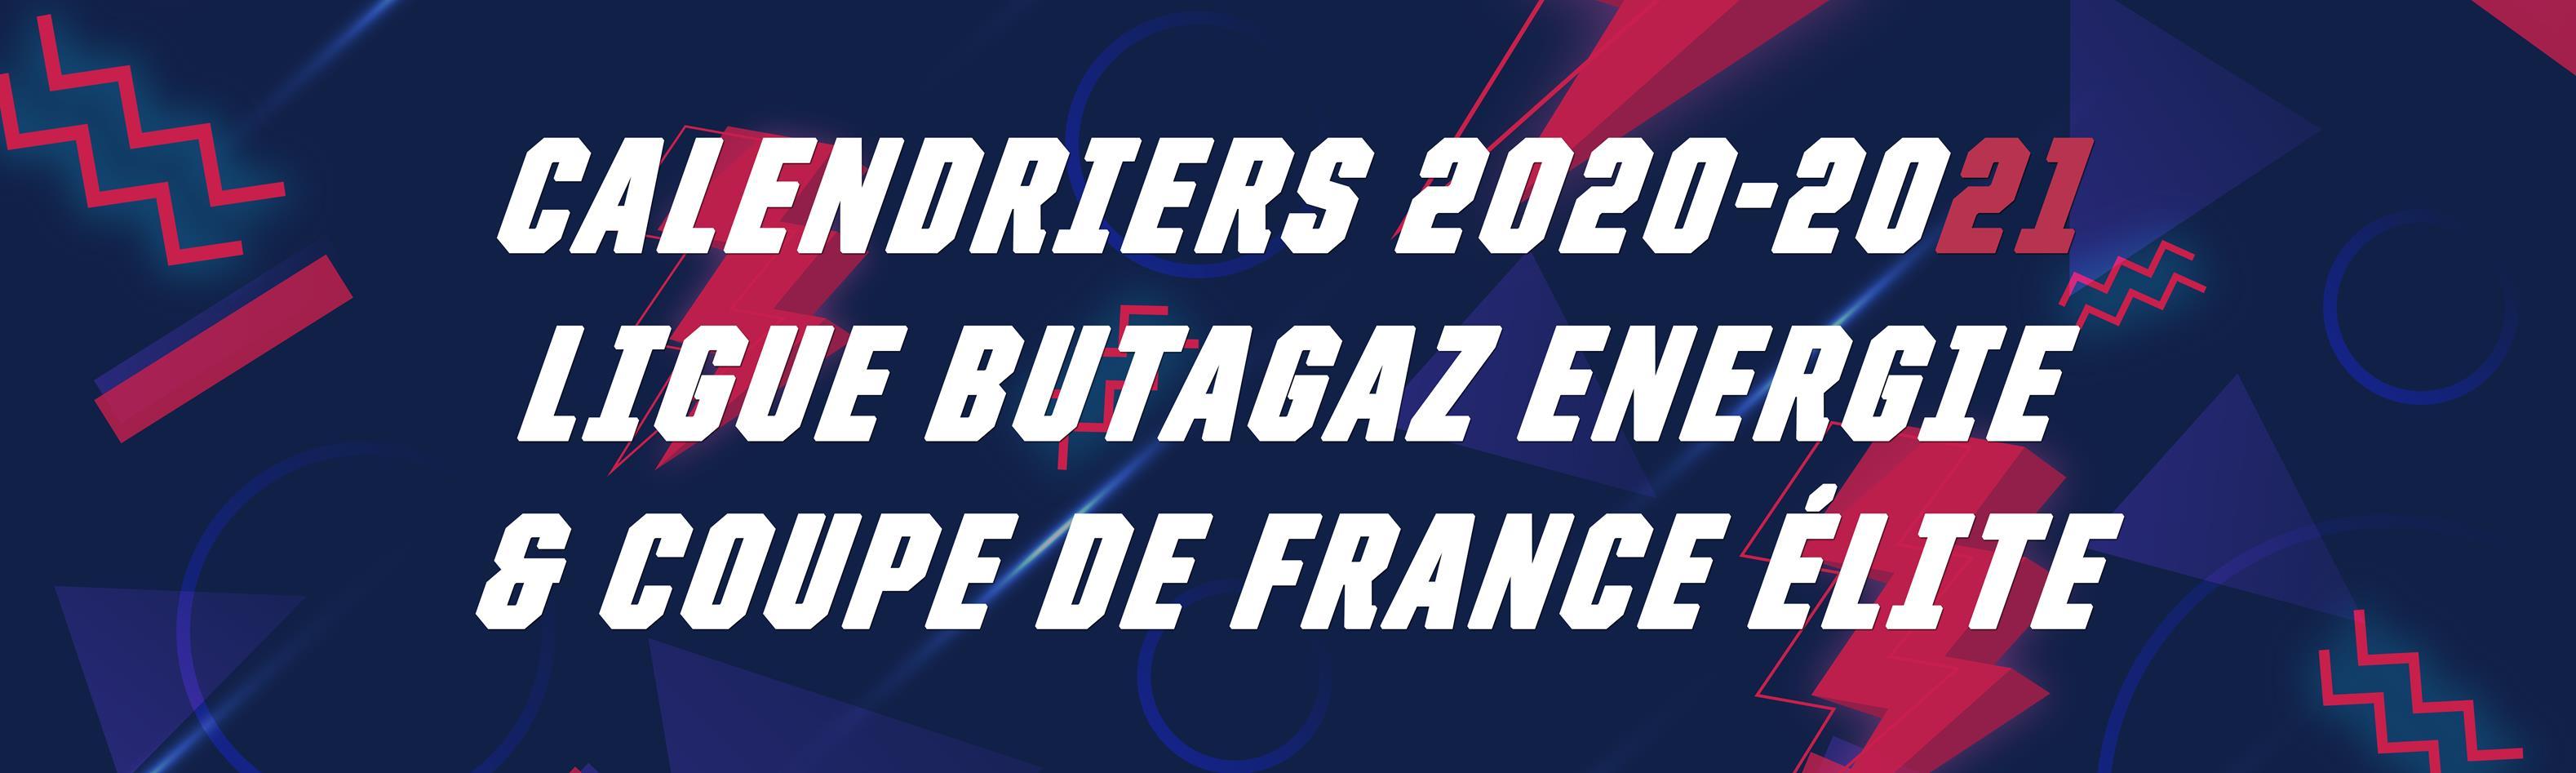 Calendriers 2020 2021 du Mérignac Handball   Mérignac HandBall